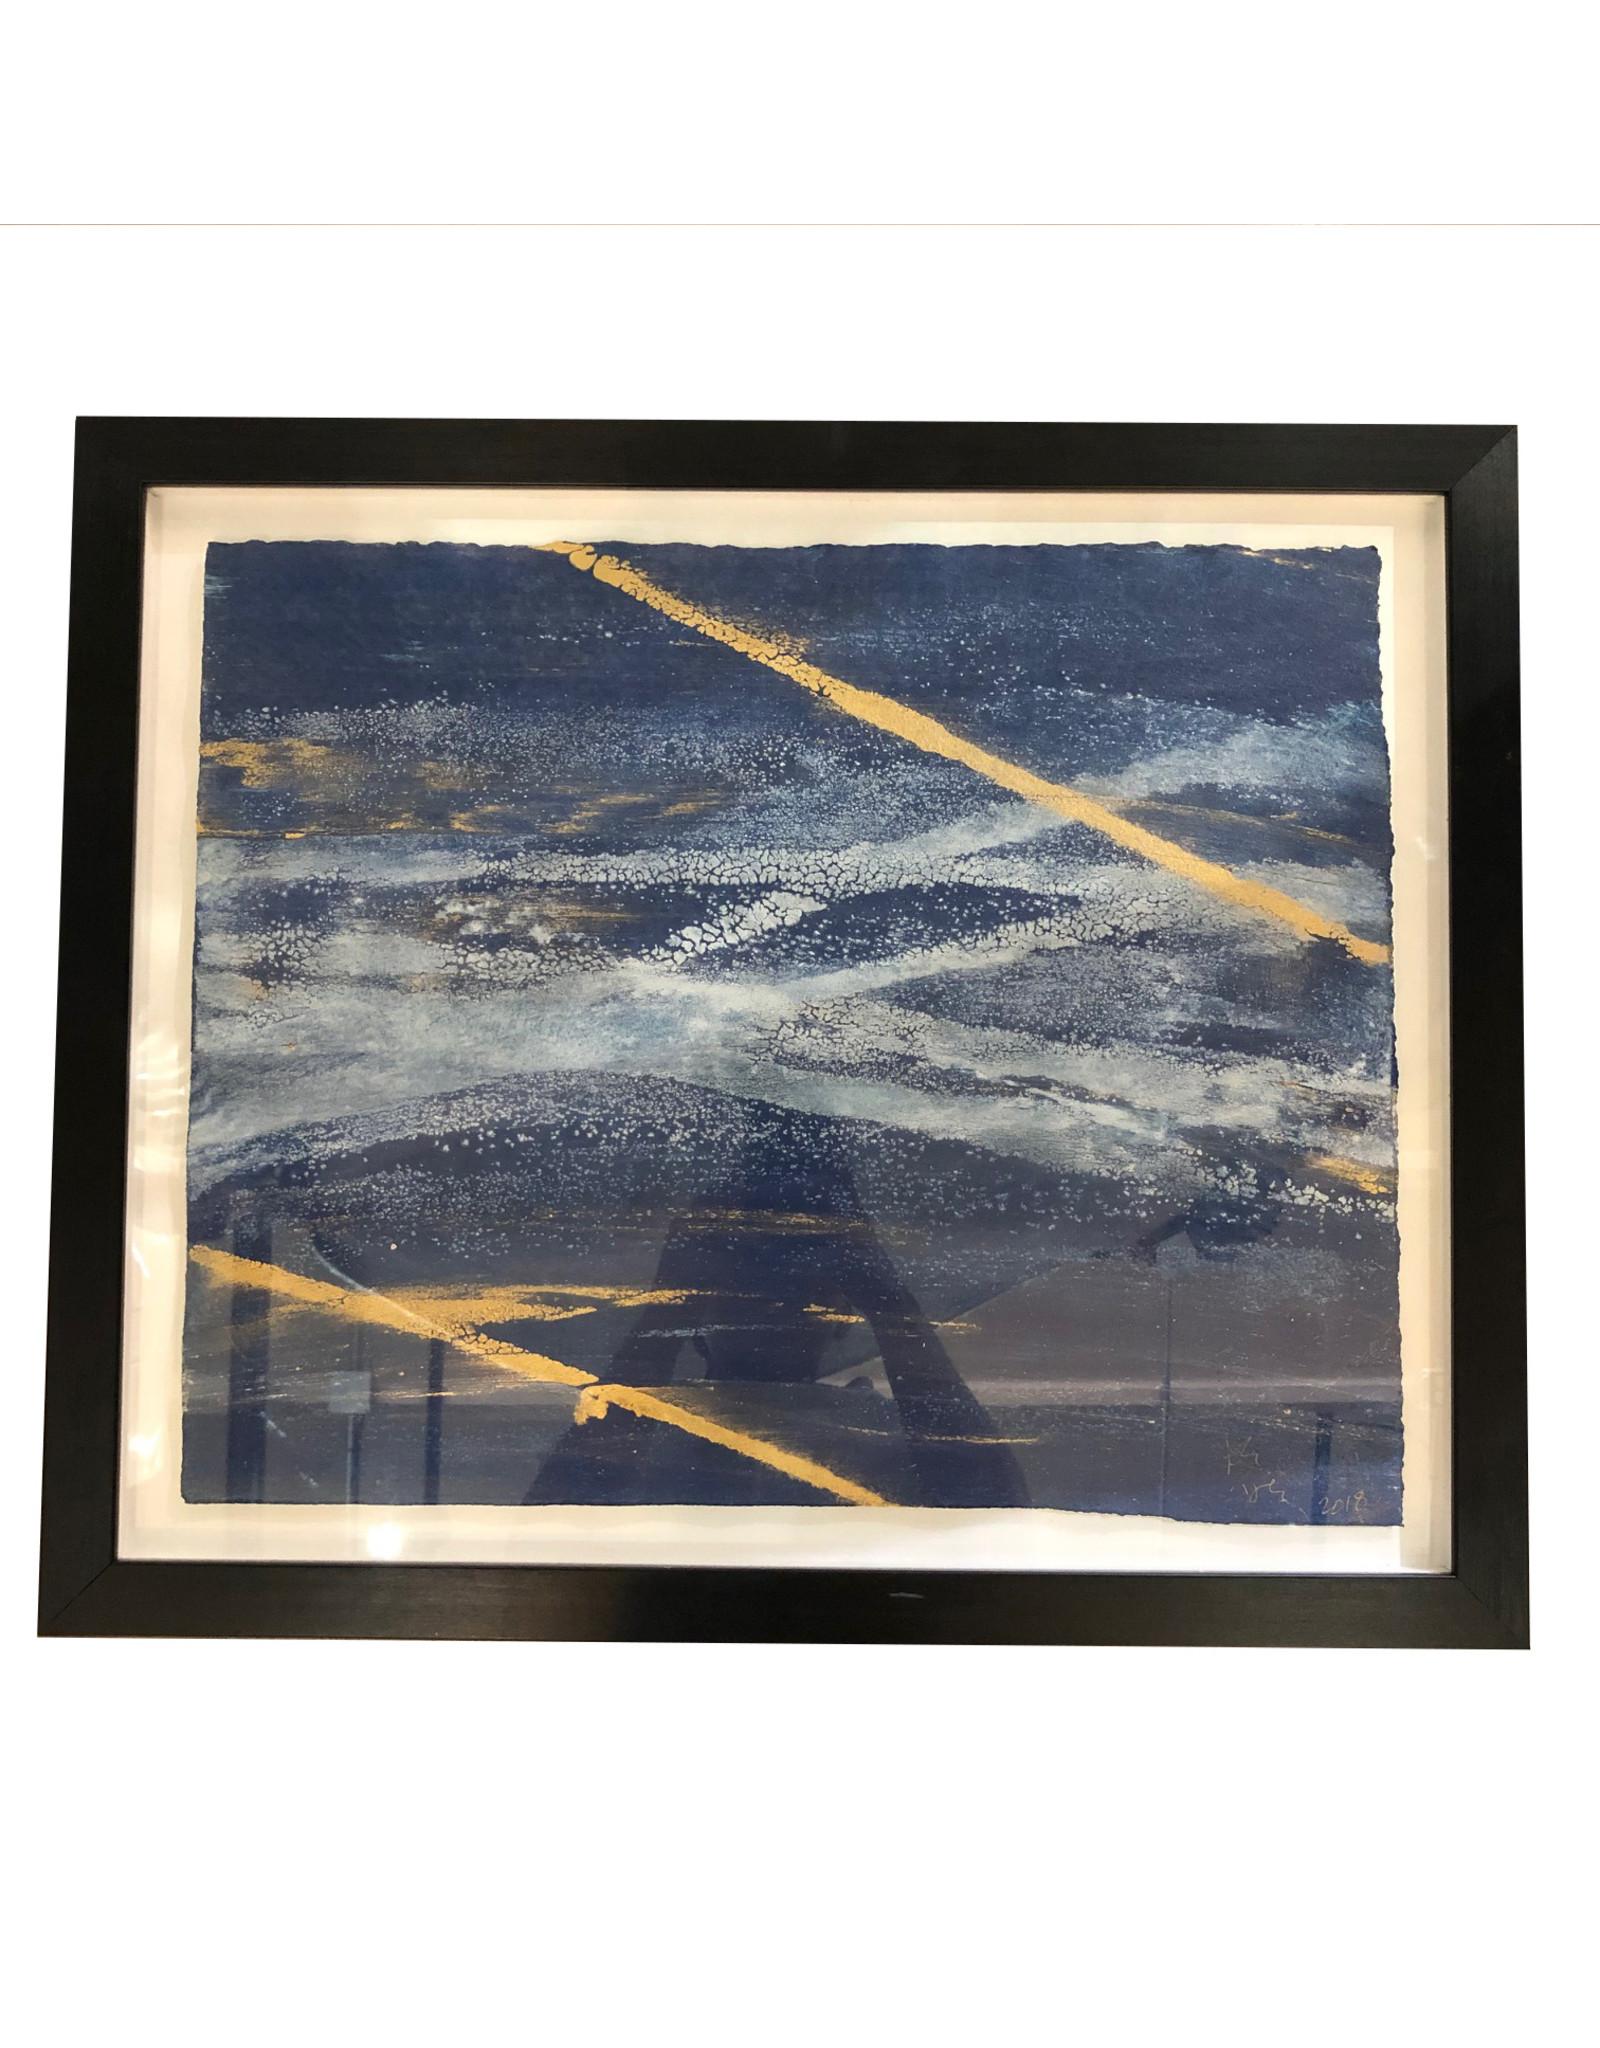 20x24 Austin James Framed Navy/Gold